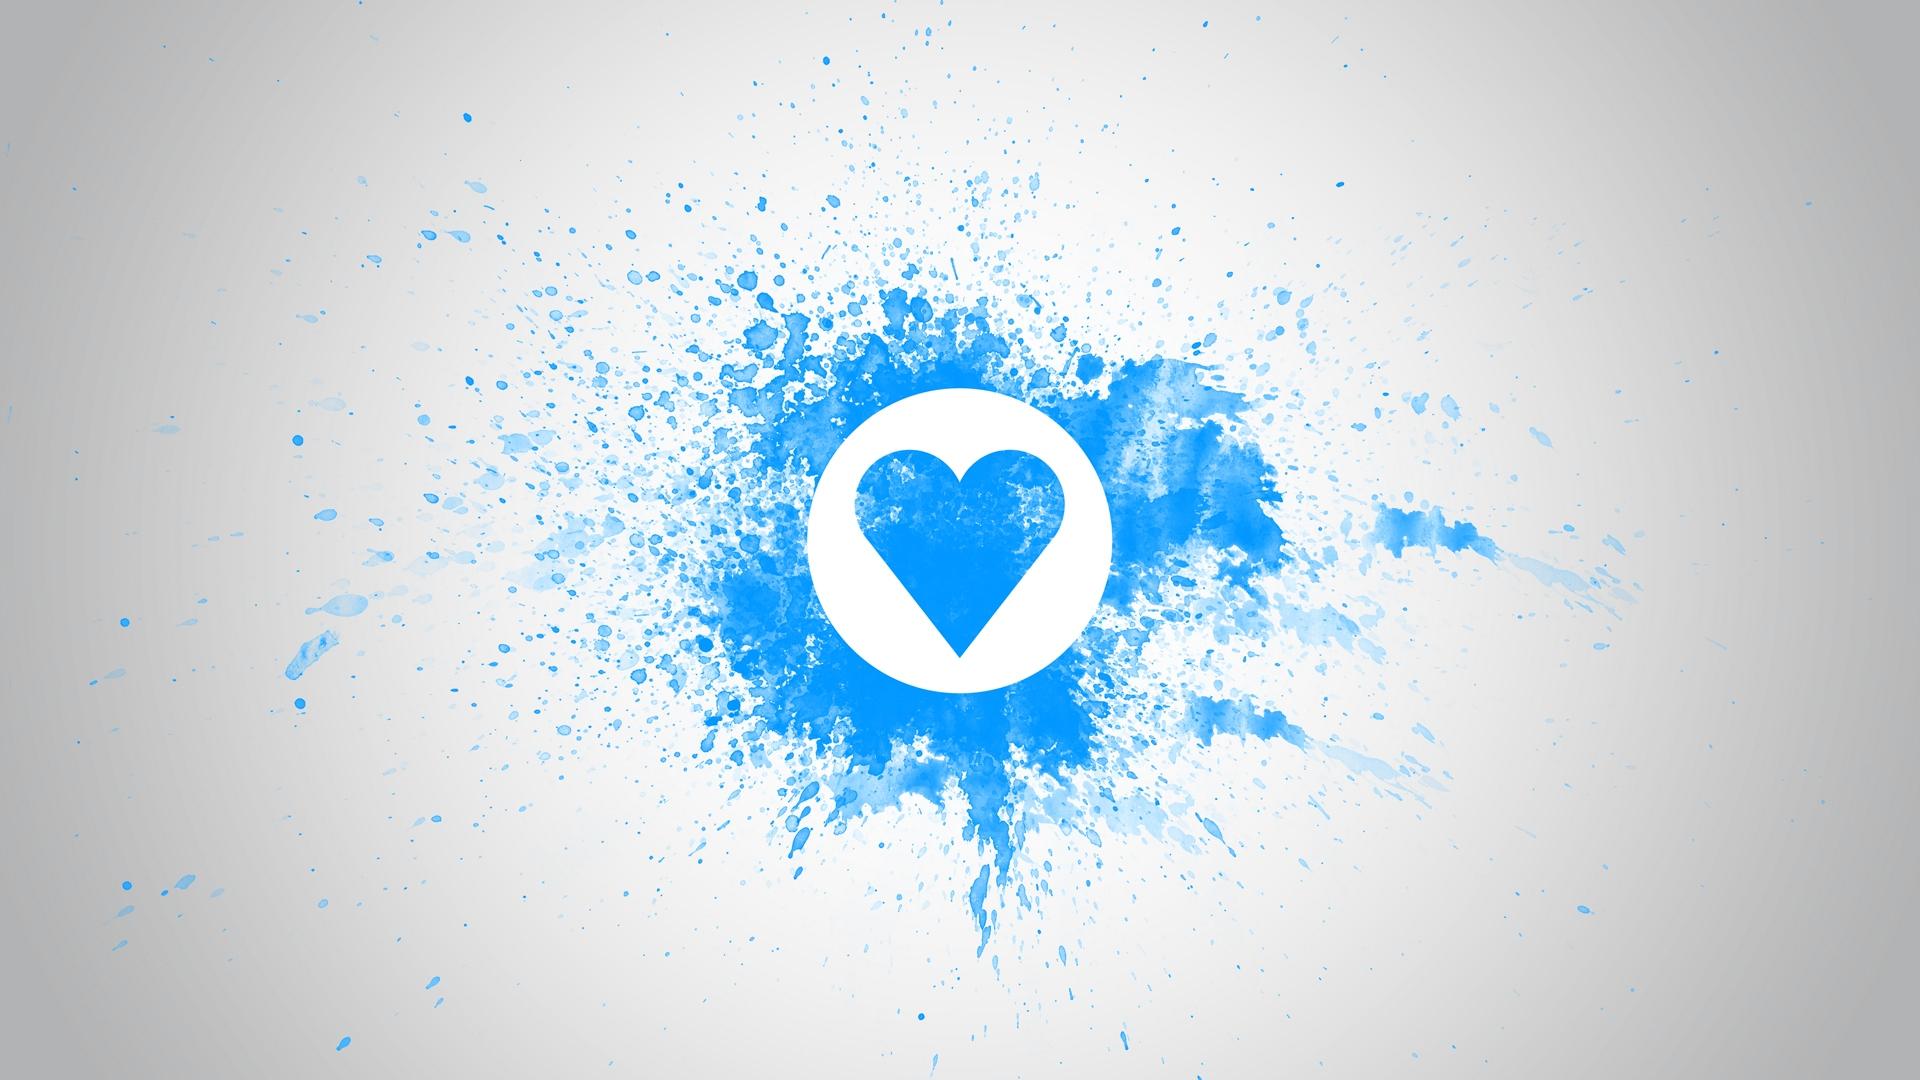 Wallpaper Drawing On Wall Chalk Blue White Heart Love